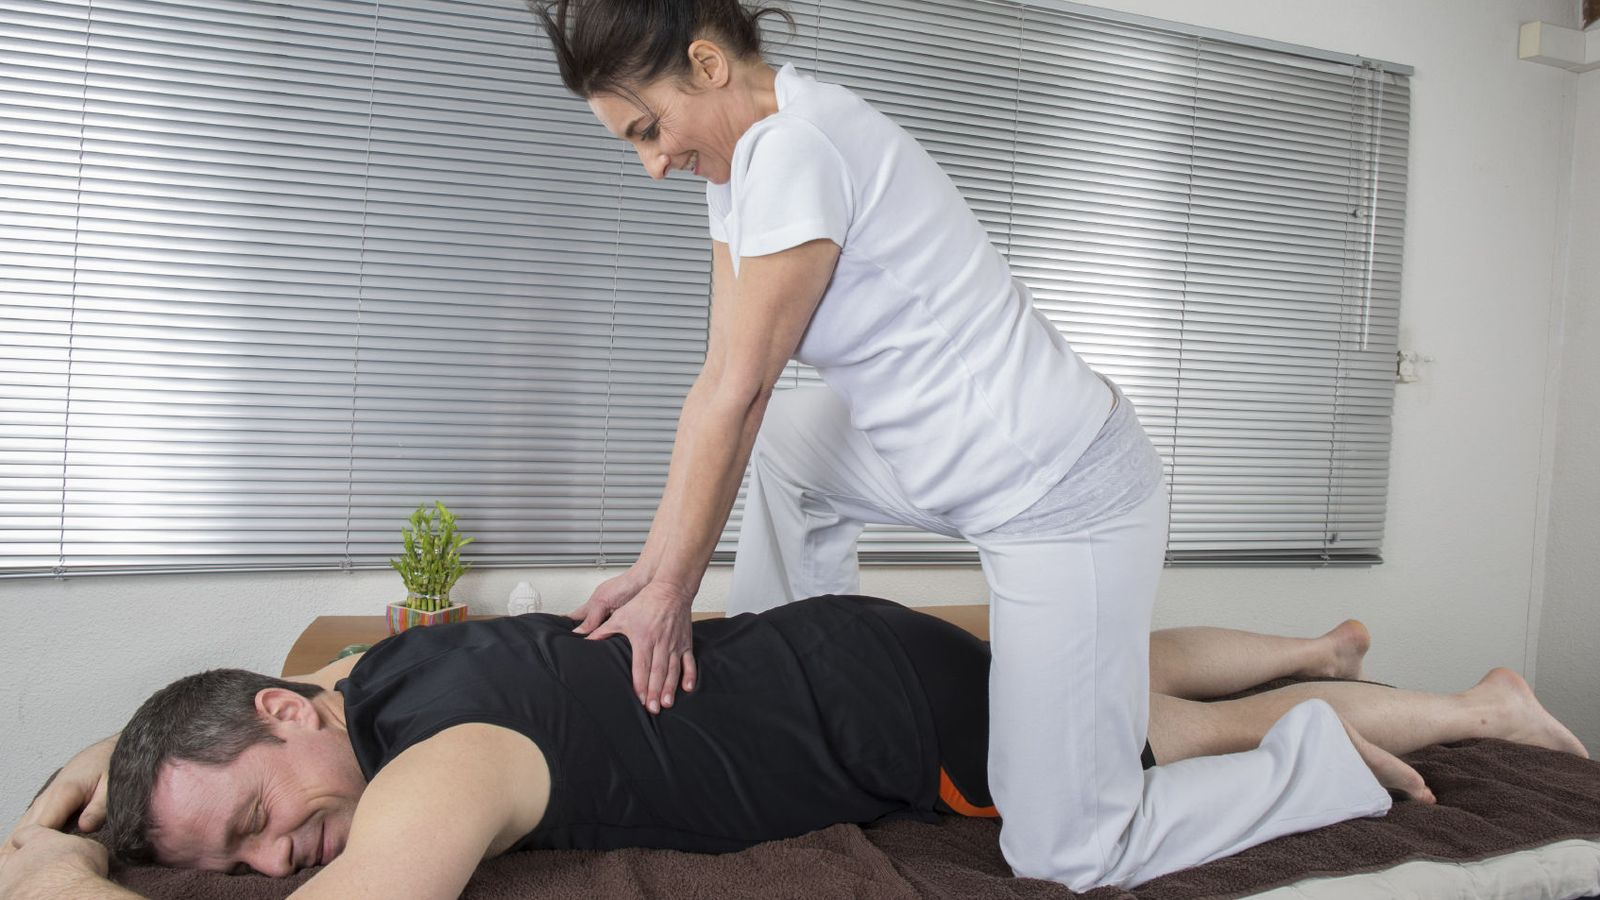 mejor masaje de final feliz sexo